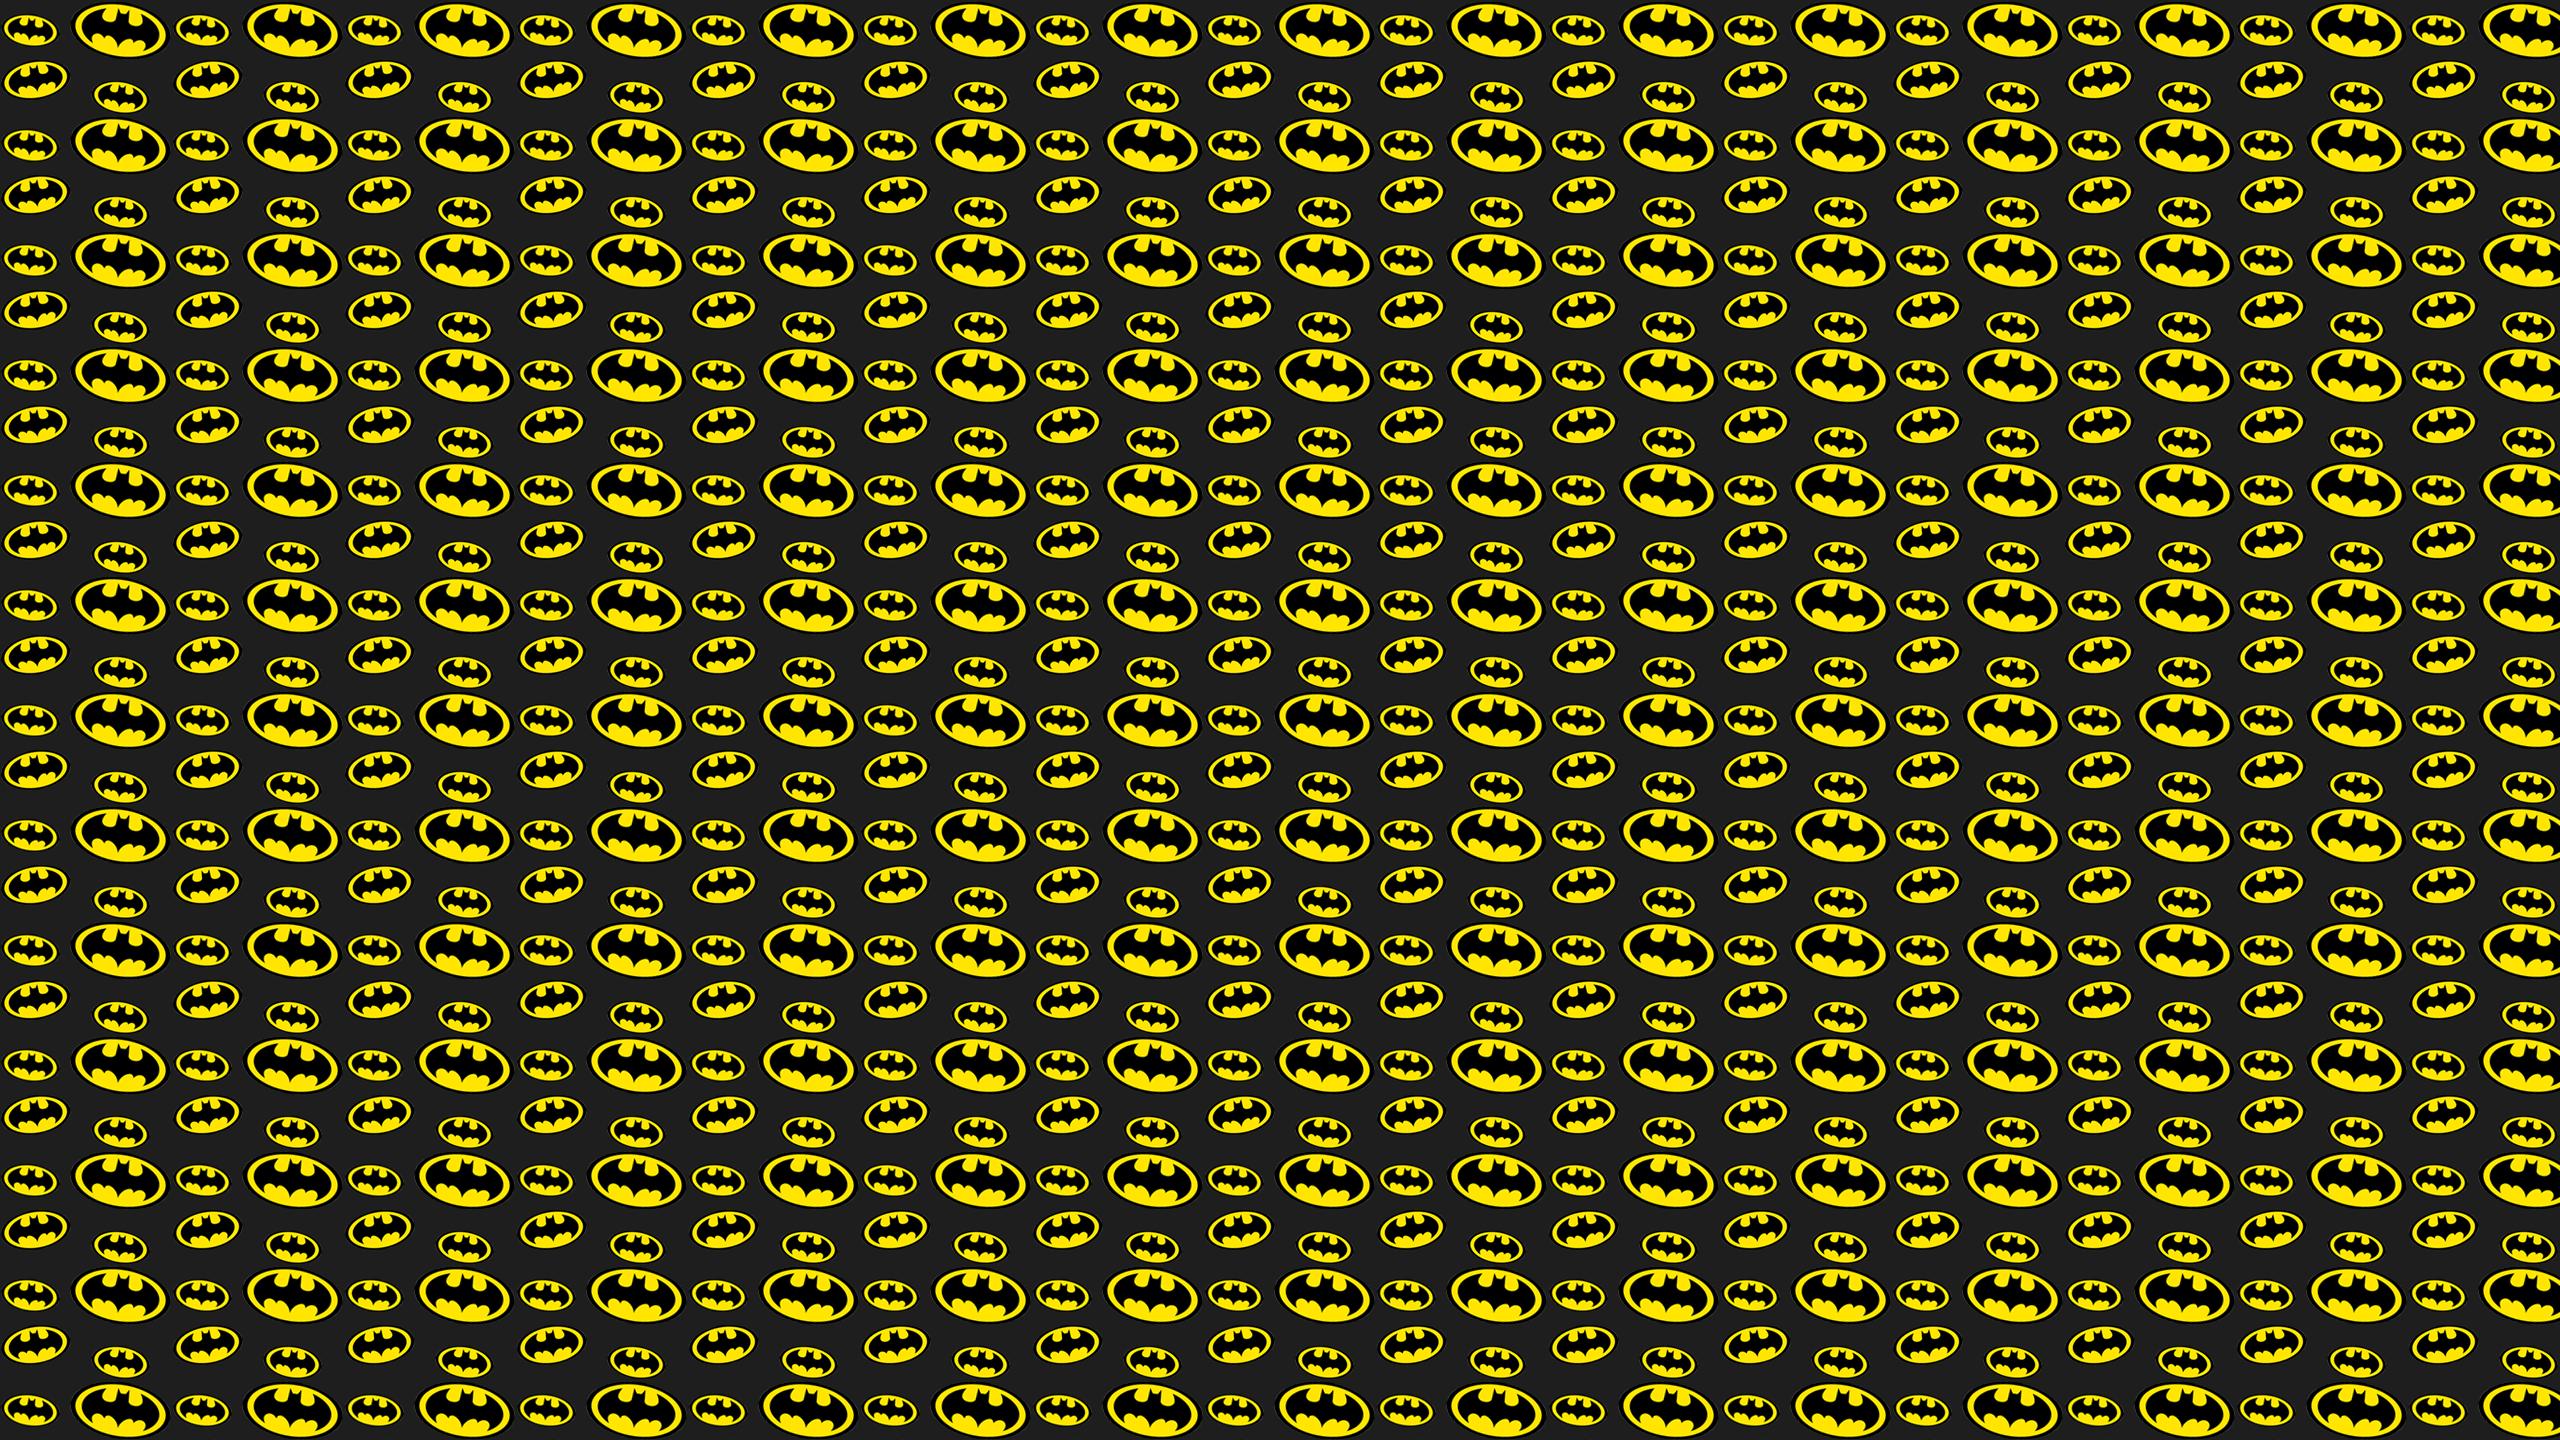 batman desktop wallpaper installing this batman desktop wallpaper is 2560x1440